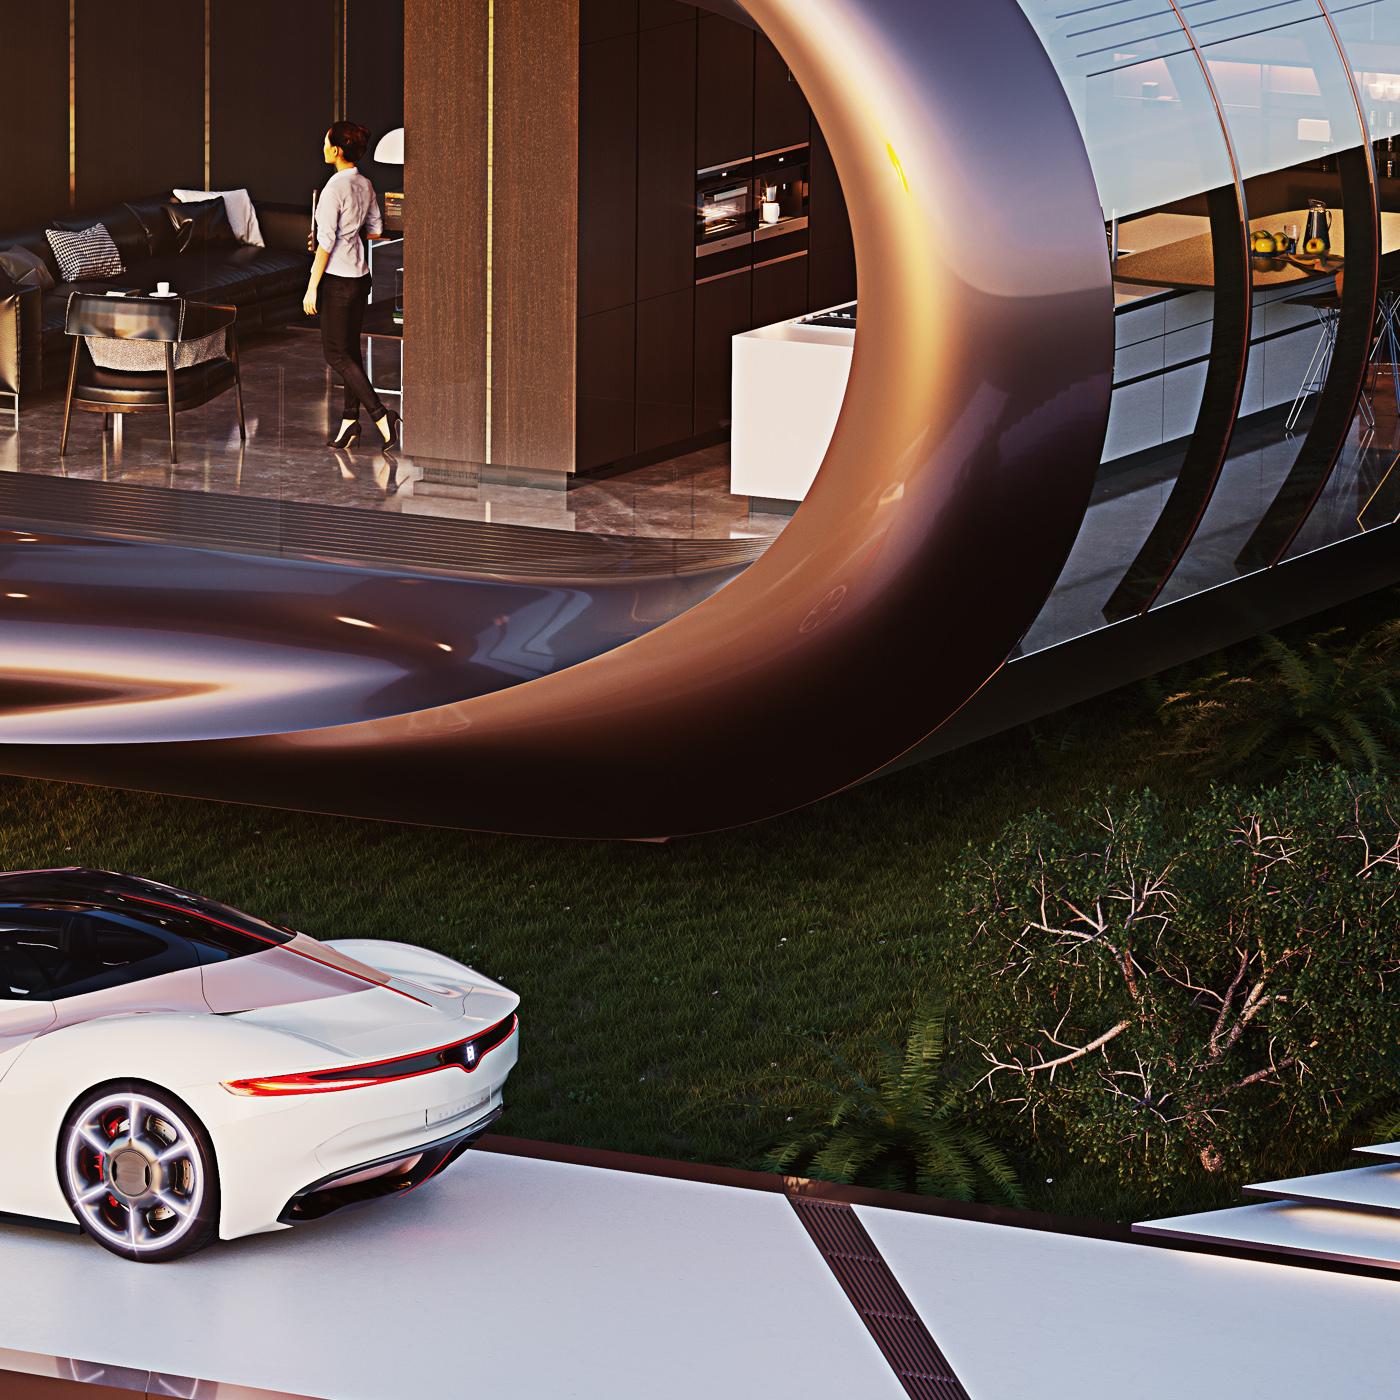 Module house futuristic luxury architecture 2.jpg